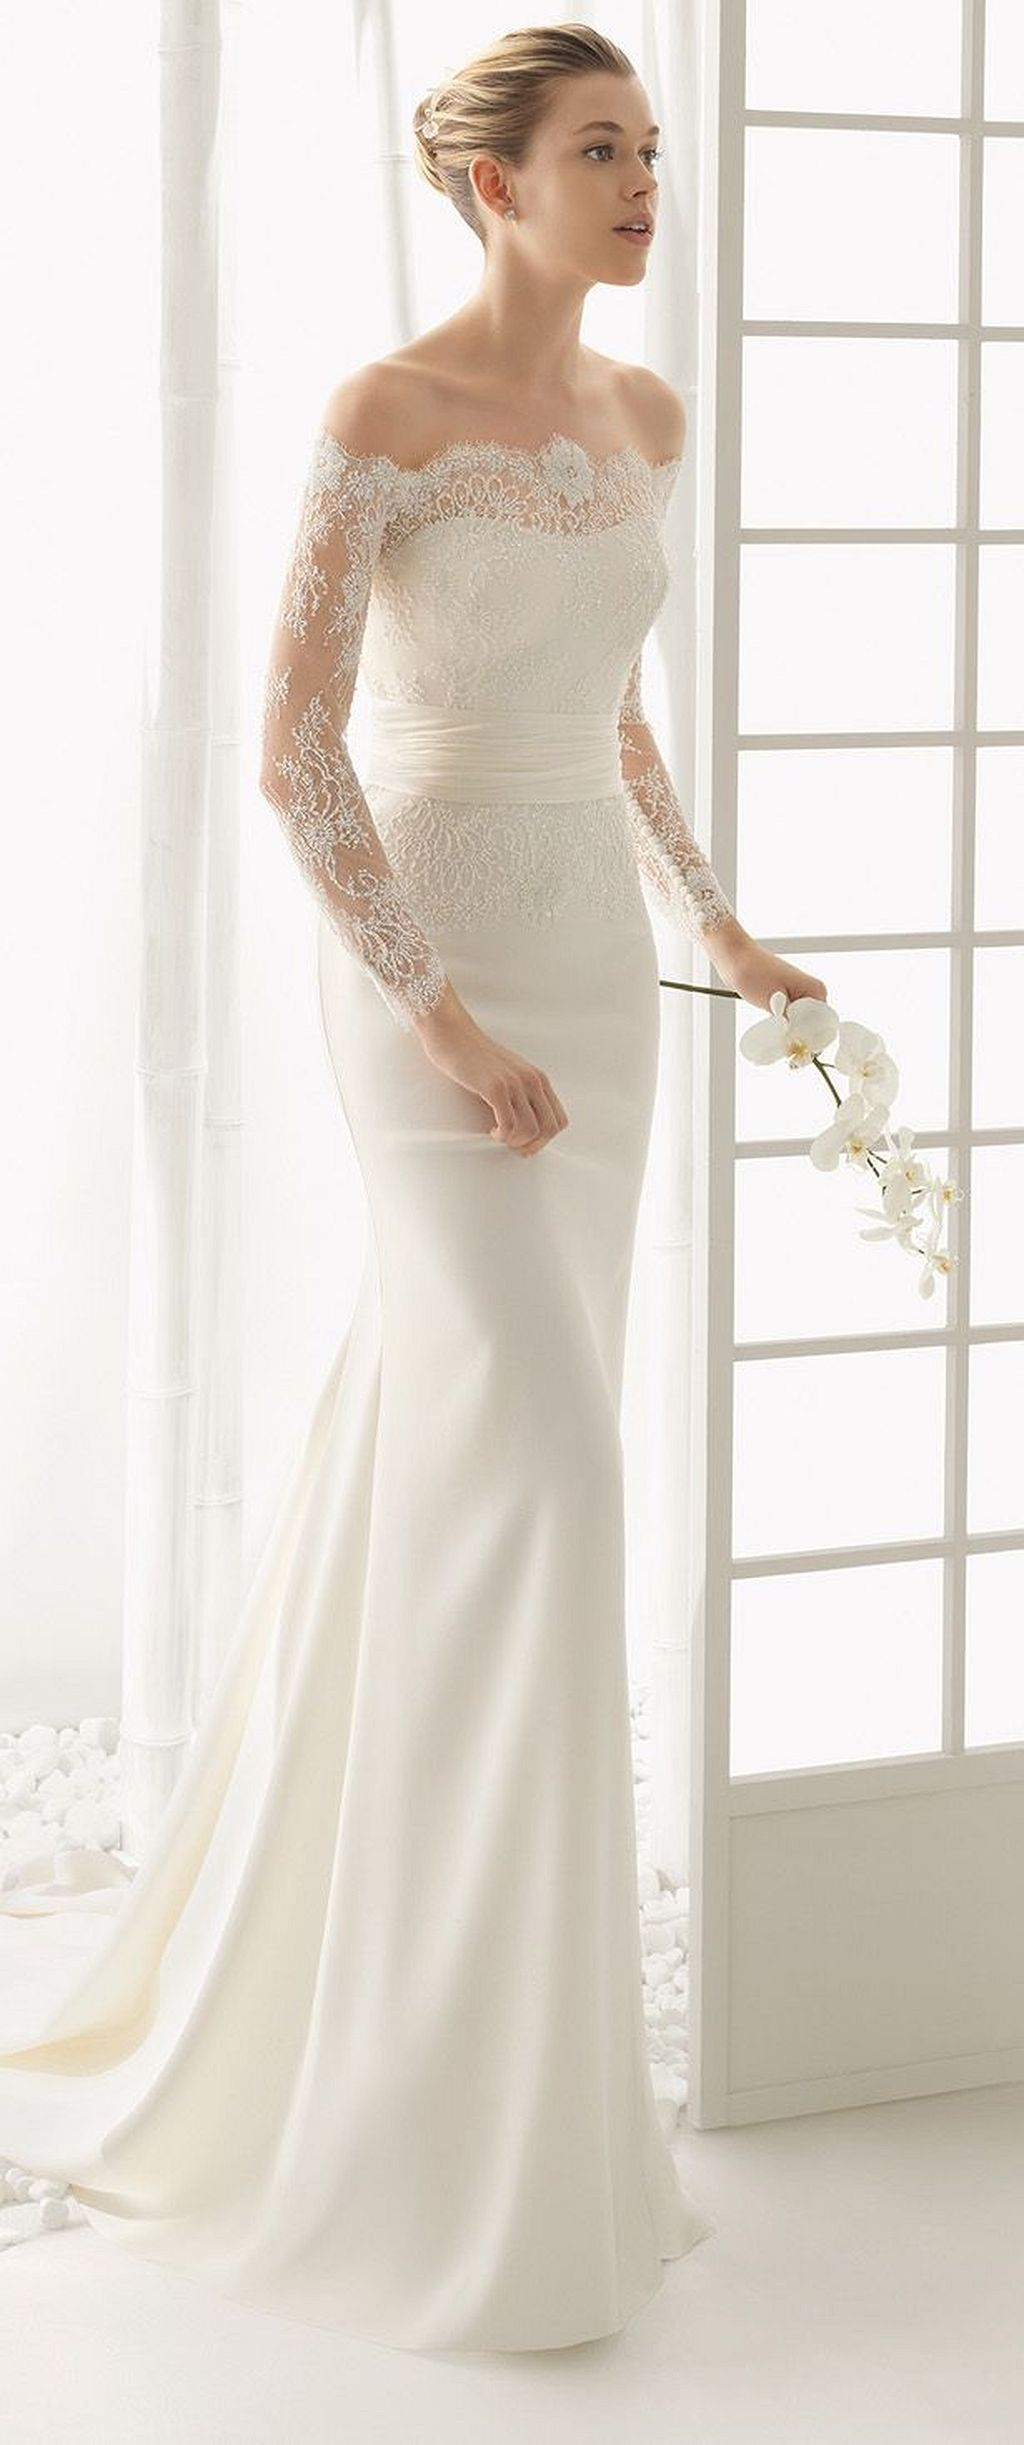 Vintage wedding dress ideas weddings wedding dress and wedding